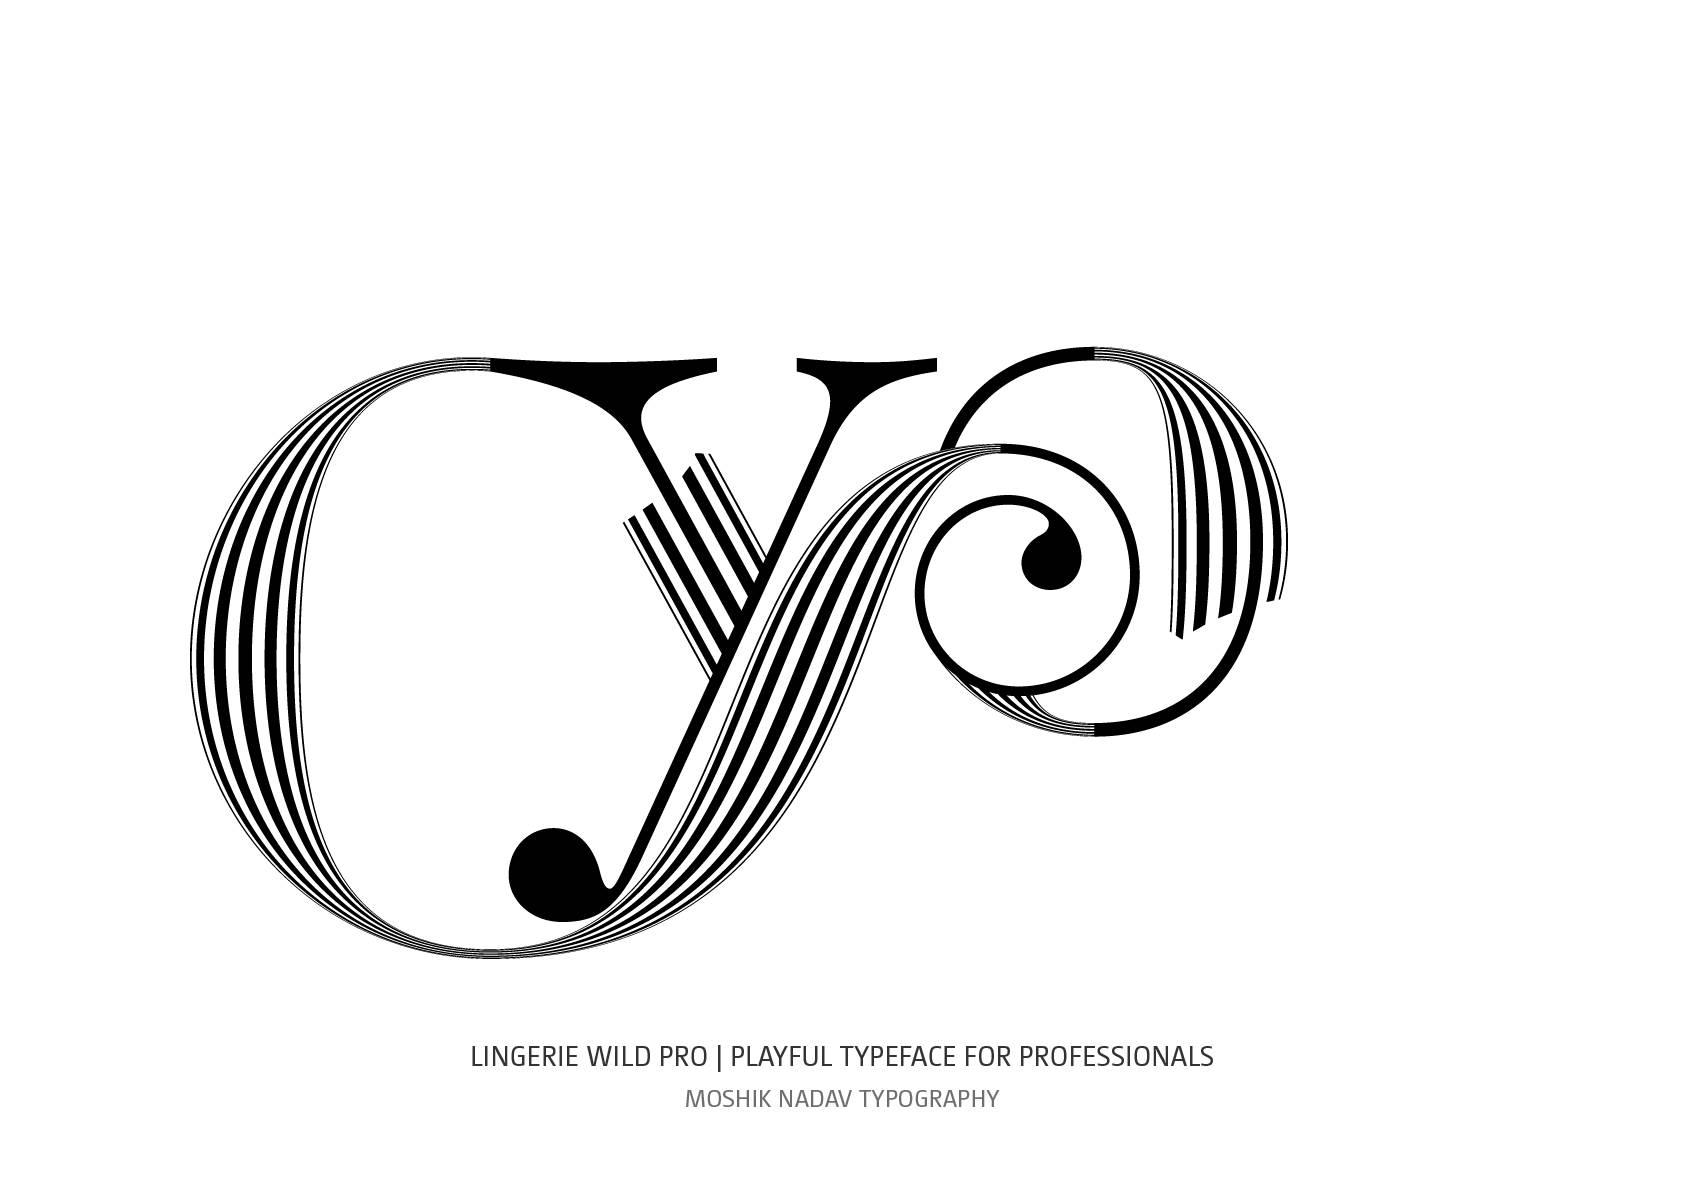 Lingerie Wild Pro Typeface yo ligature by Moshik Nadav Typography